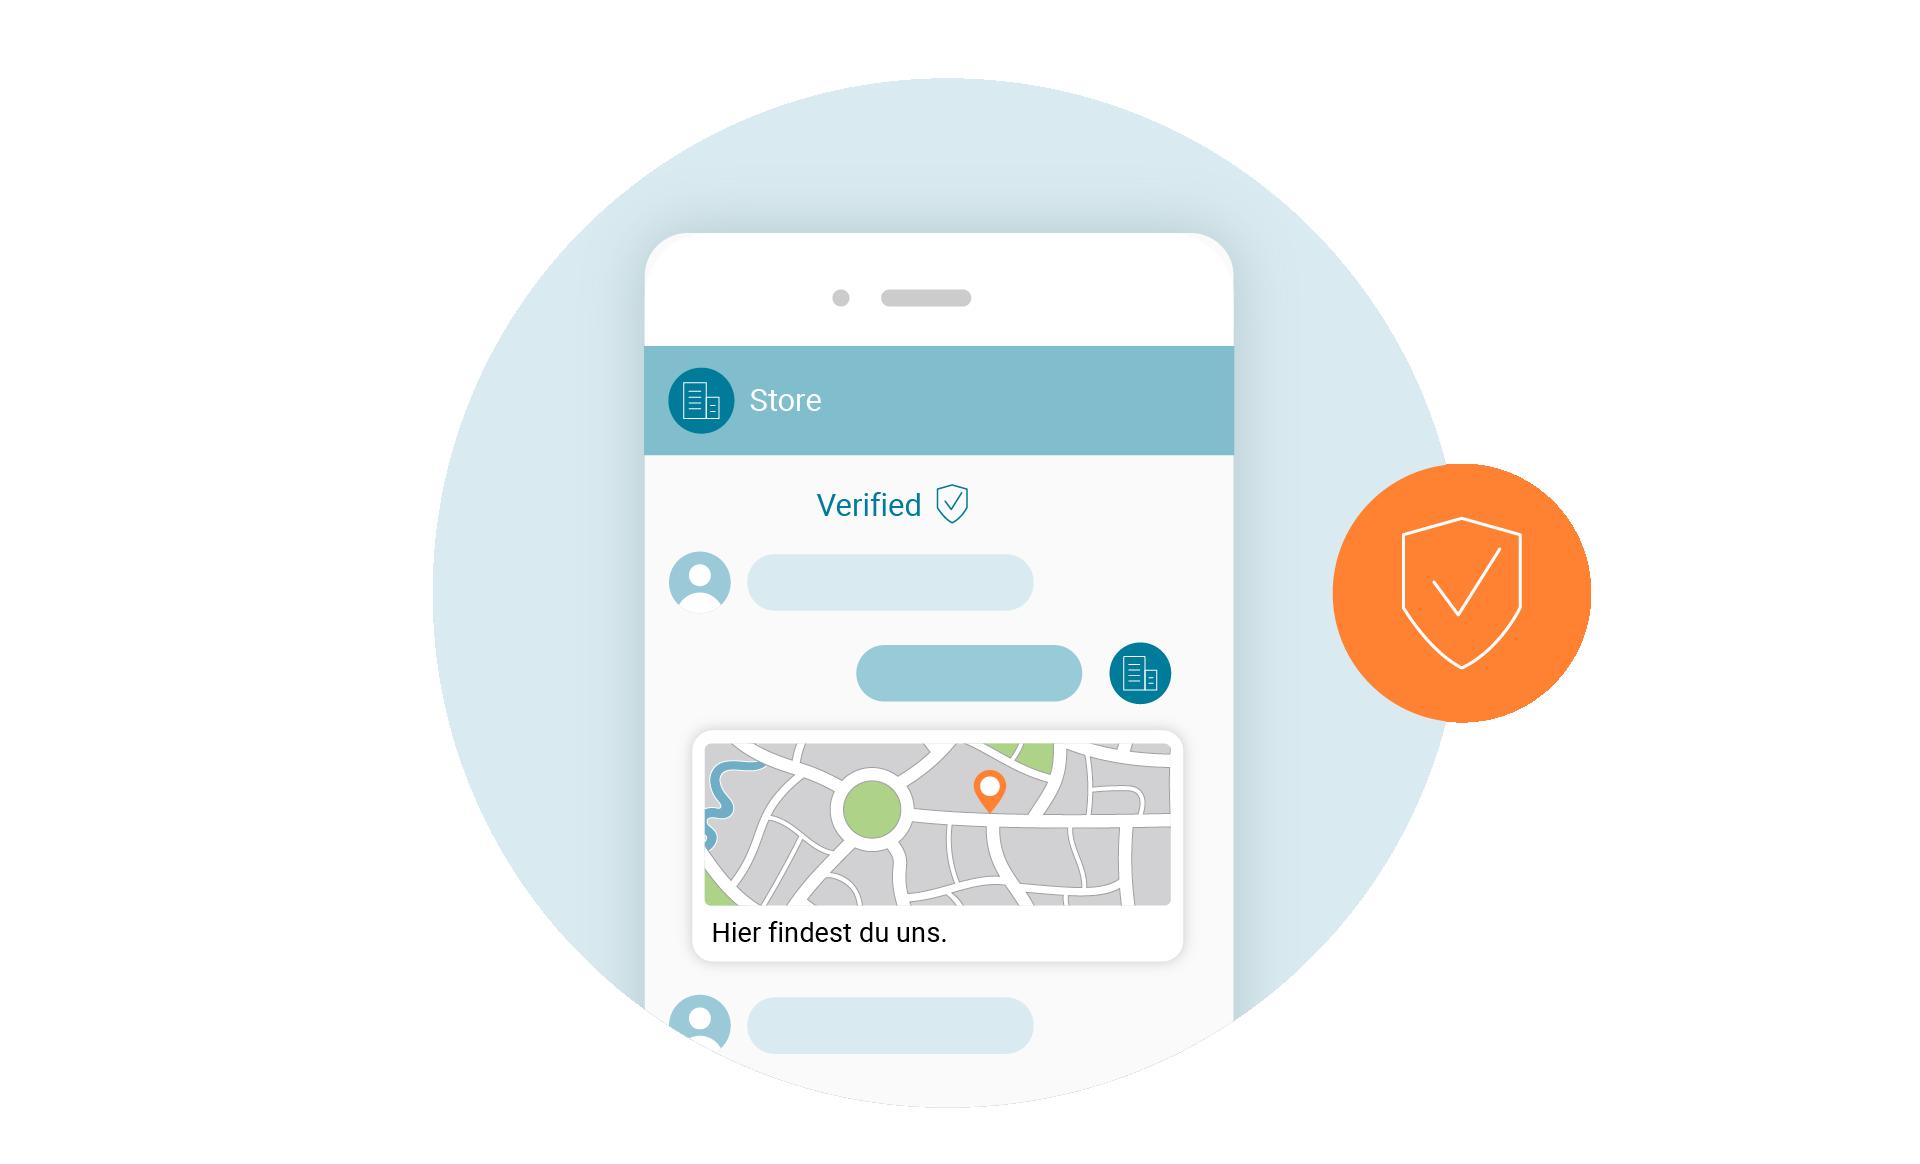 LINK Mobility - RCS-Verifizierung schafft Vertrauen beim Empfänger